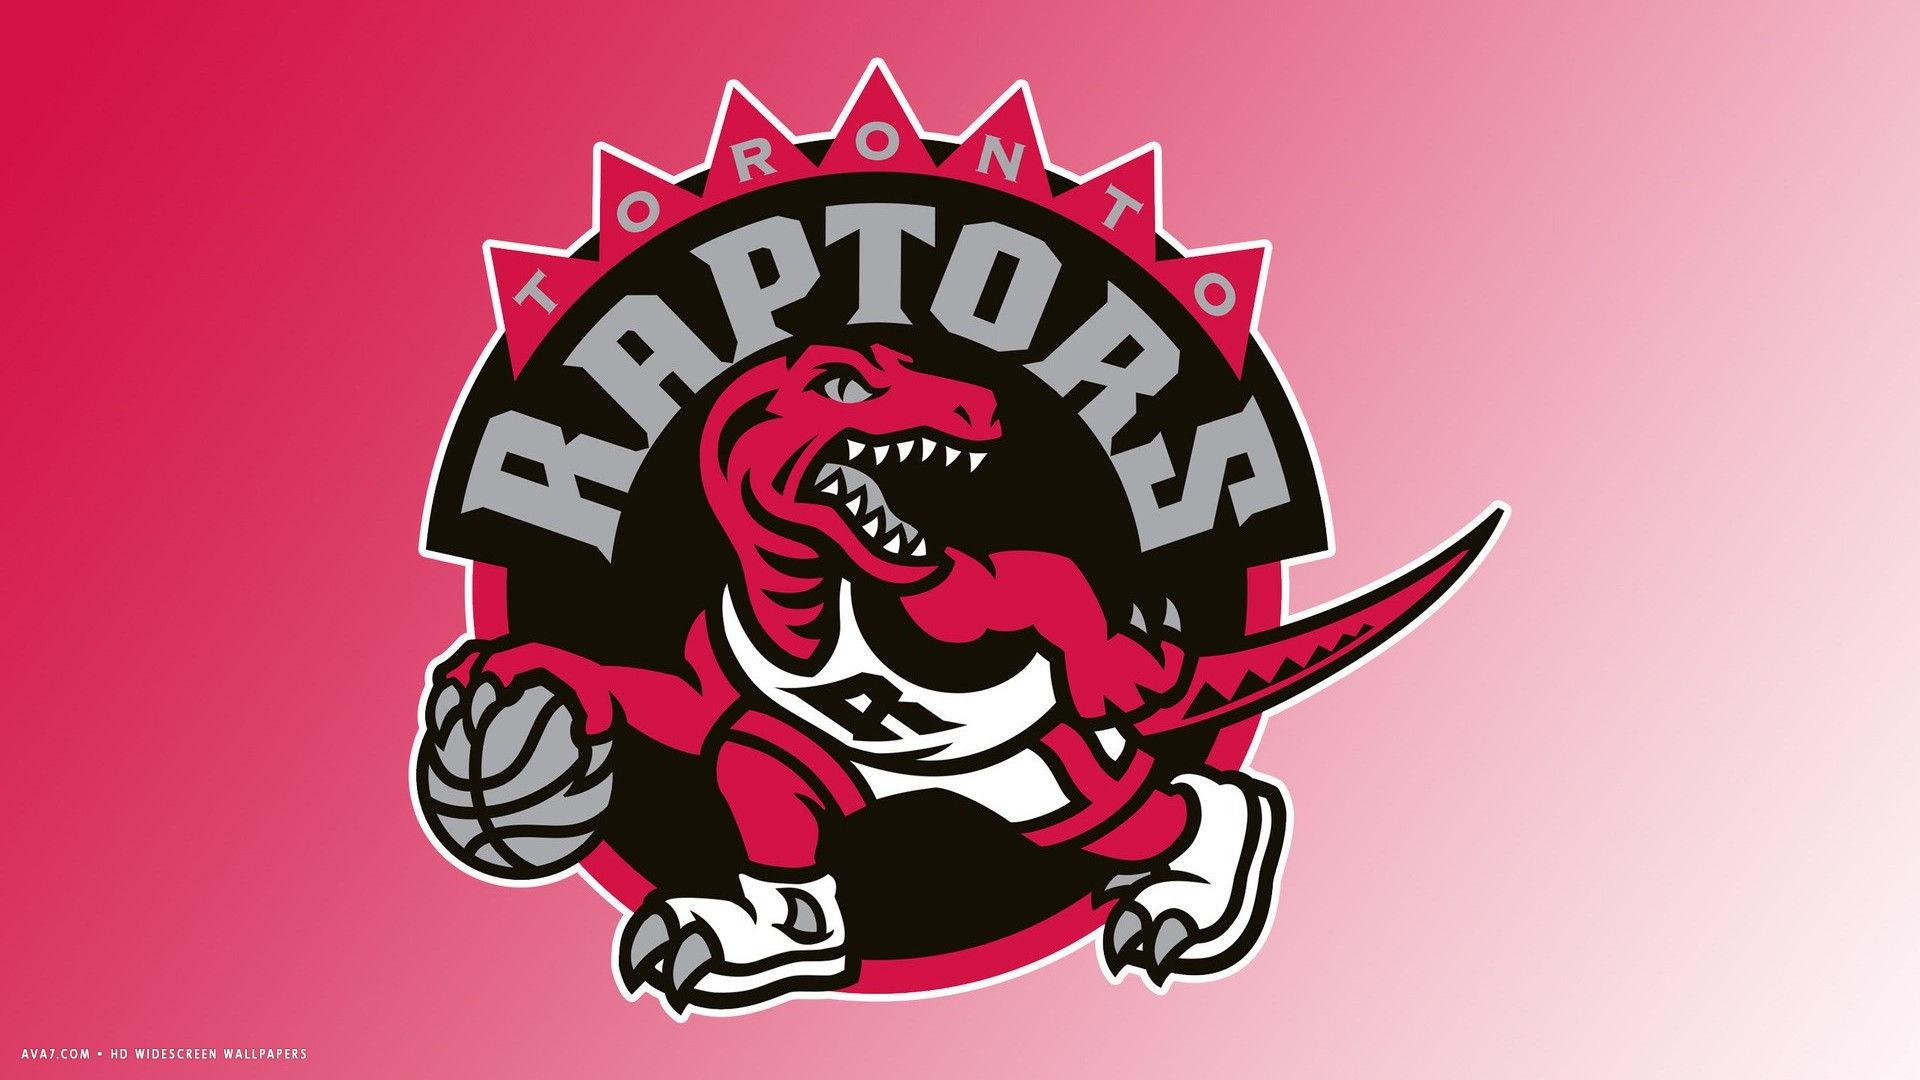 toronto raptors nba basketball team hd widescreen wallpaper